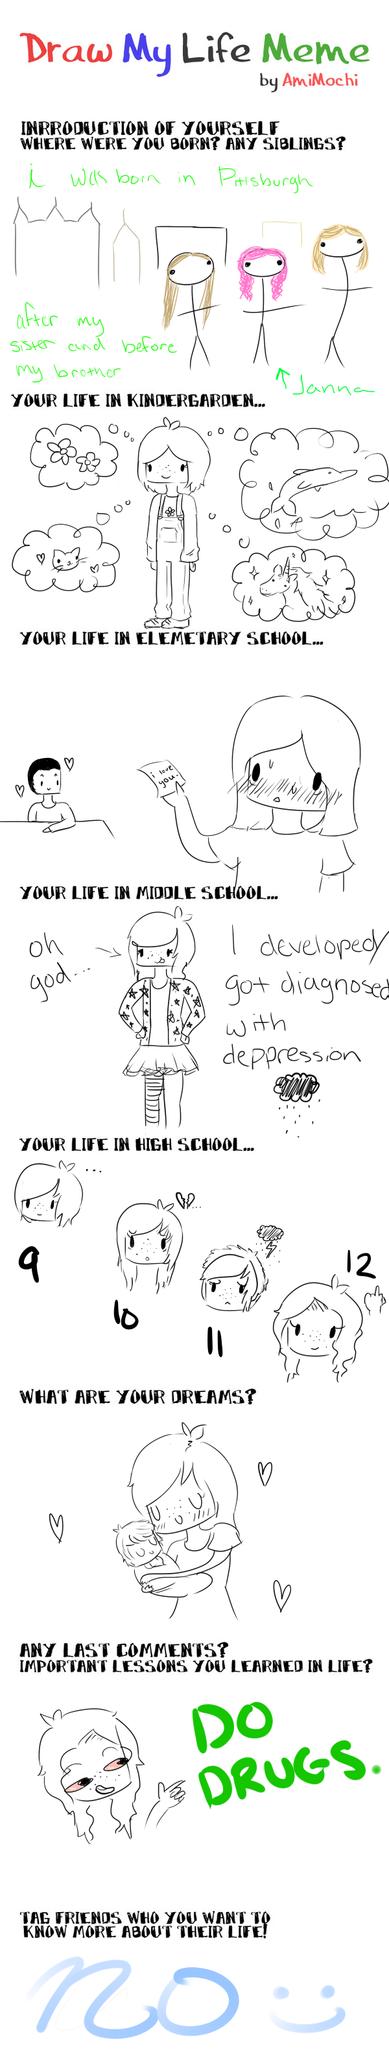 Draw My Life Meme by SlaughterDisturbance